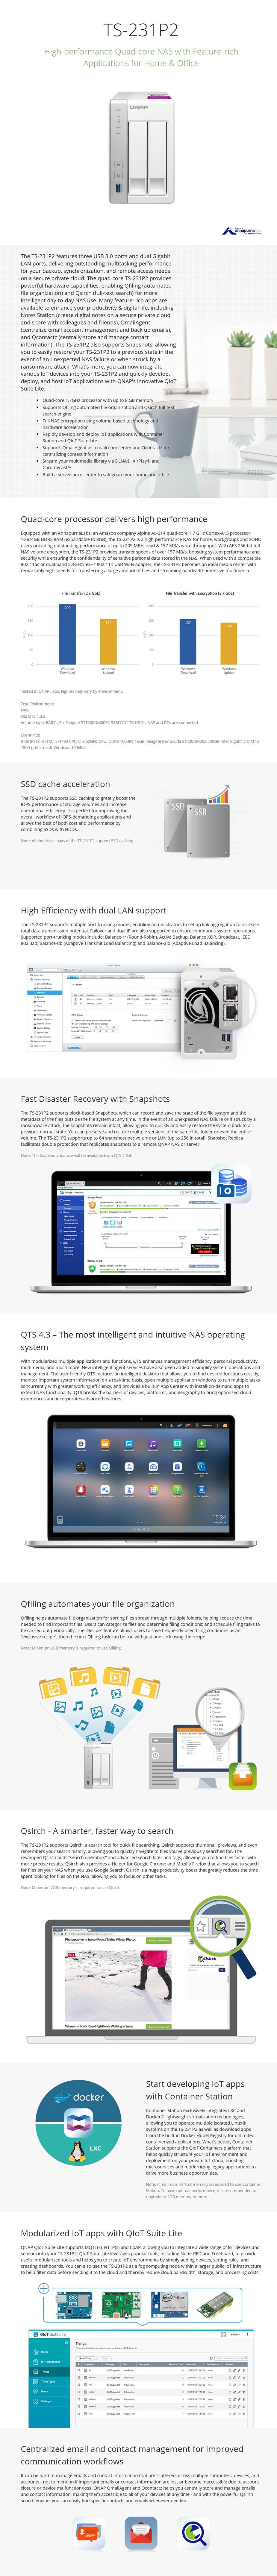 QNAP TS-231P2-4G 2 Bay Diskless NAS Alpine AL-314 Quad Core 1.7GHz CPU 4GB RAM - Desktop Overview 1